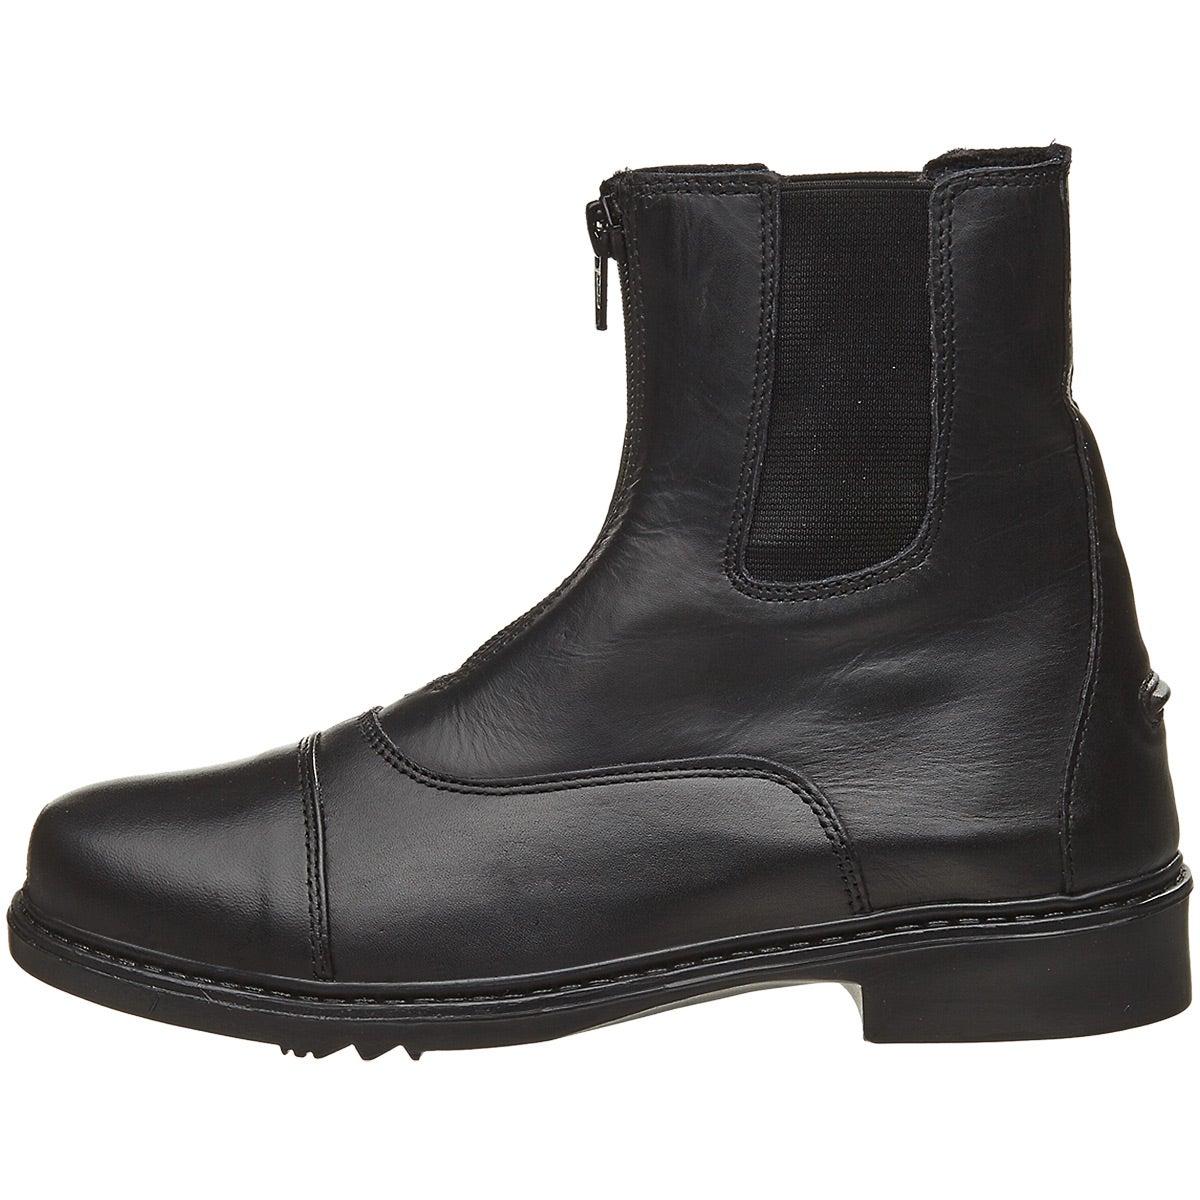 07e0ed942752 TuffRider Women s Perfect Front Zip Paddock Boots - Riding Warehouse